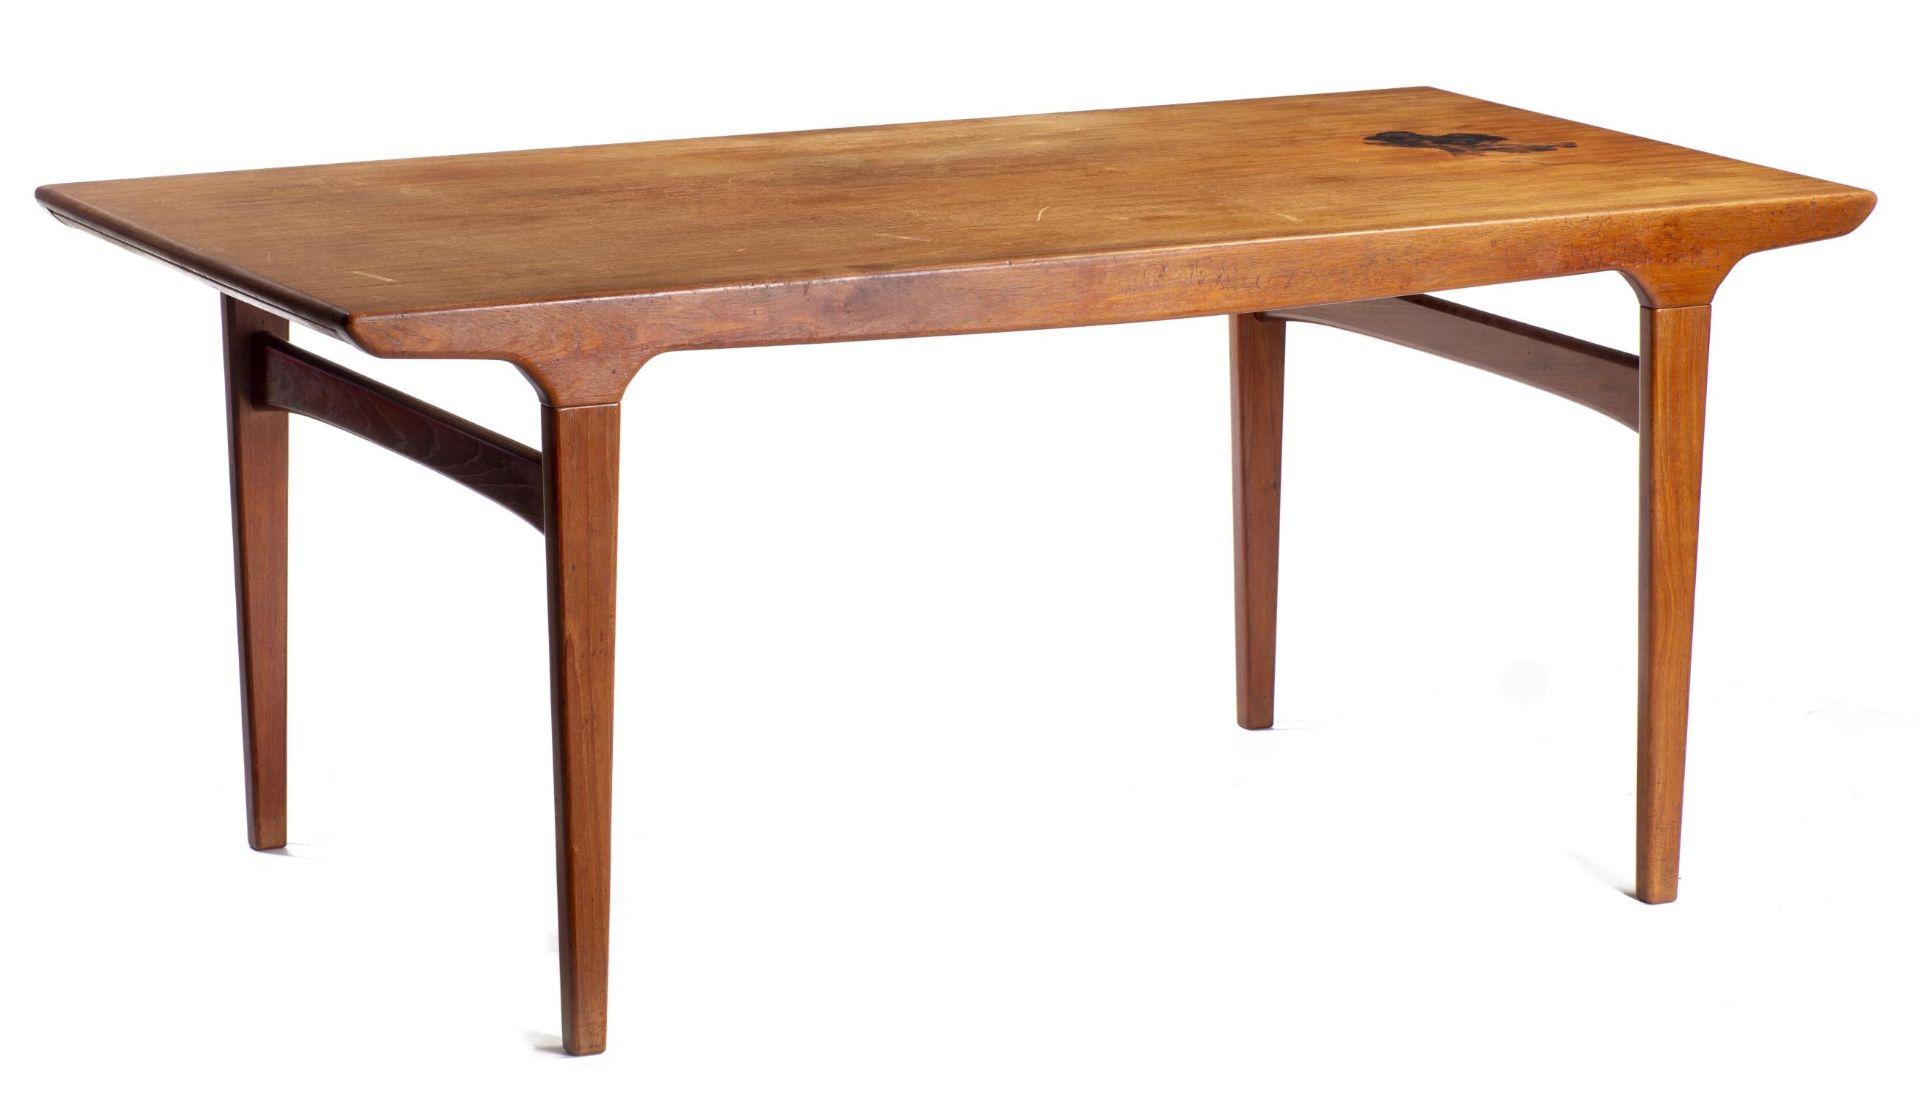 Table en teck, probablement Hans Wegner Design - Bild 2 aus 5